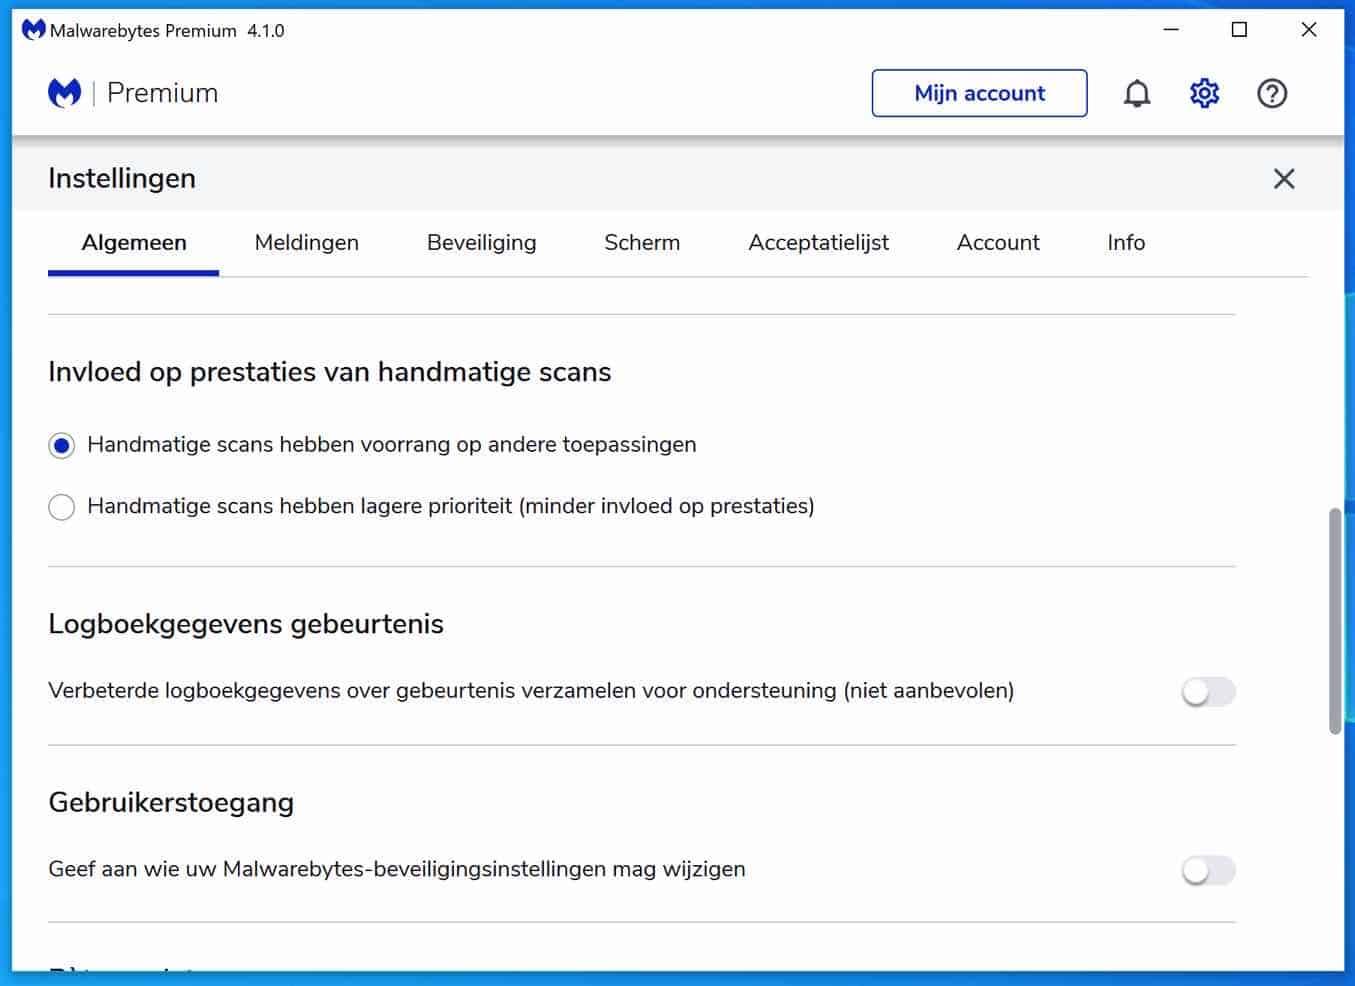 malwarebytes logboekgegevens